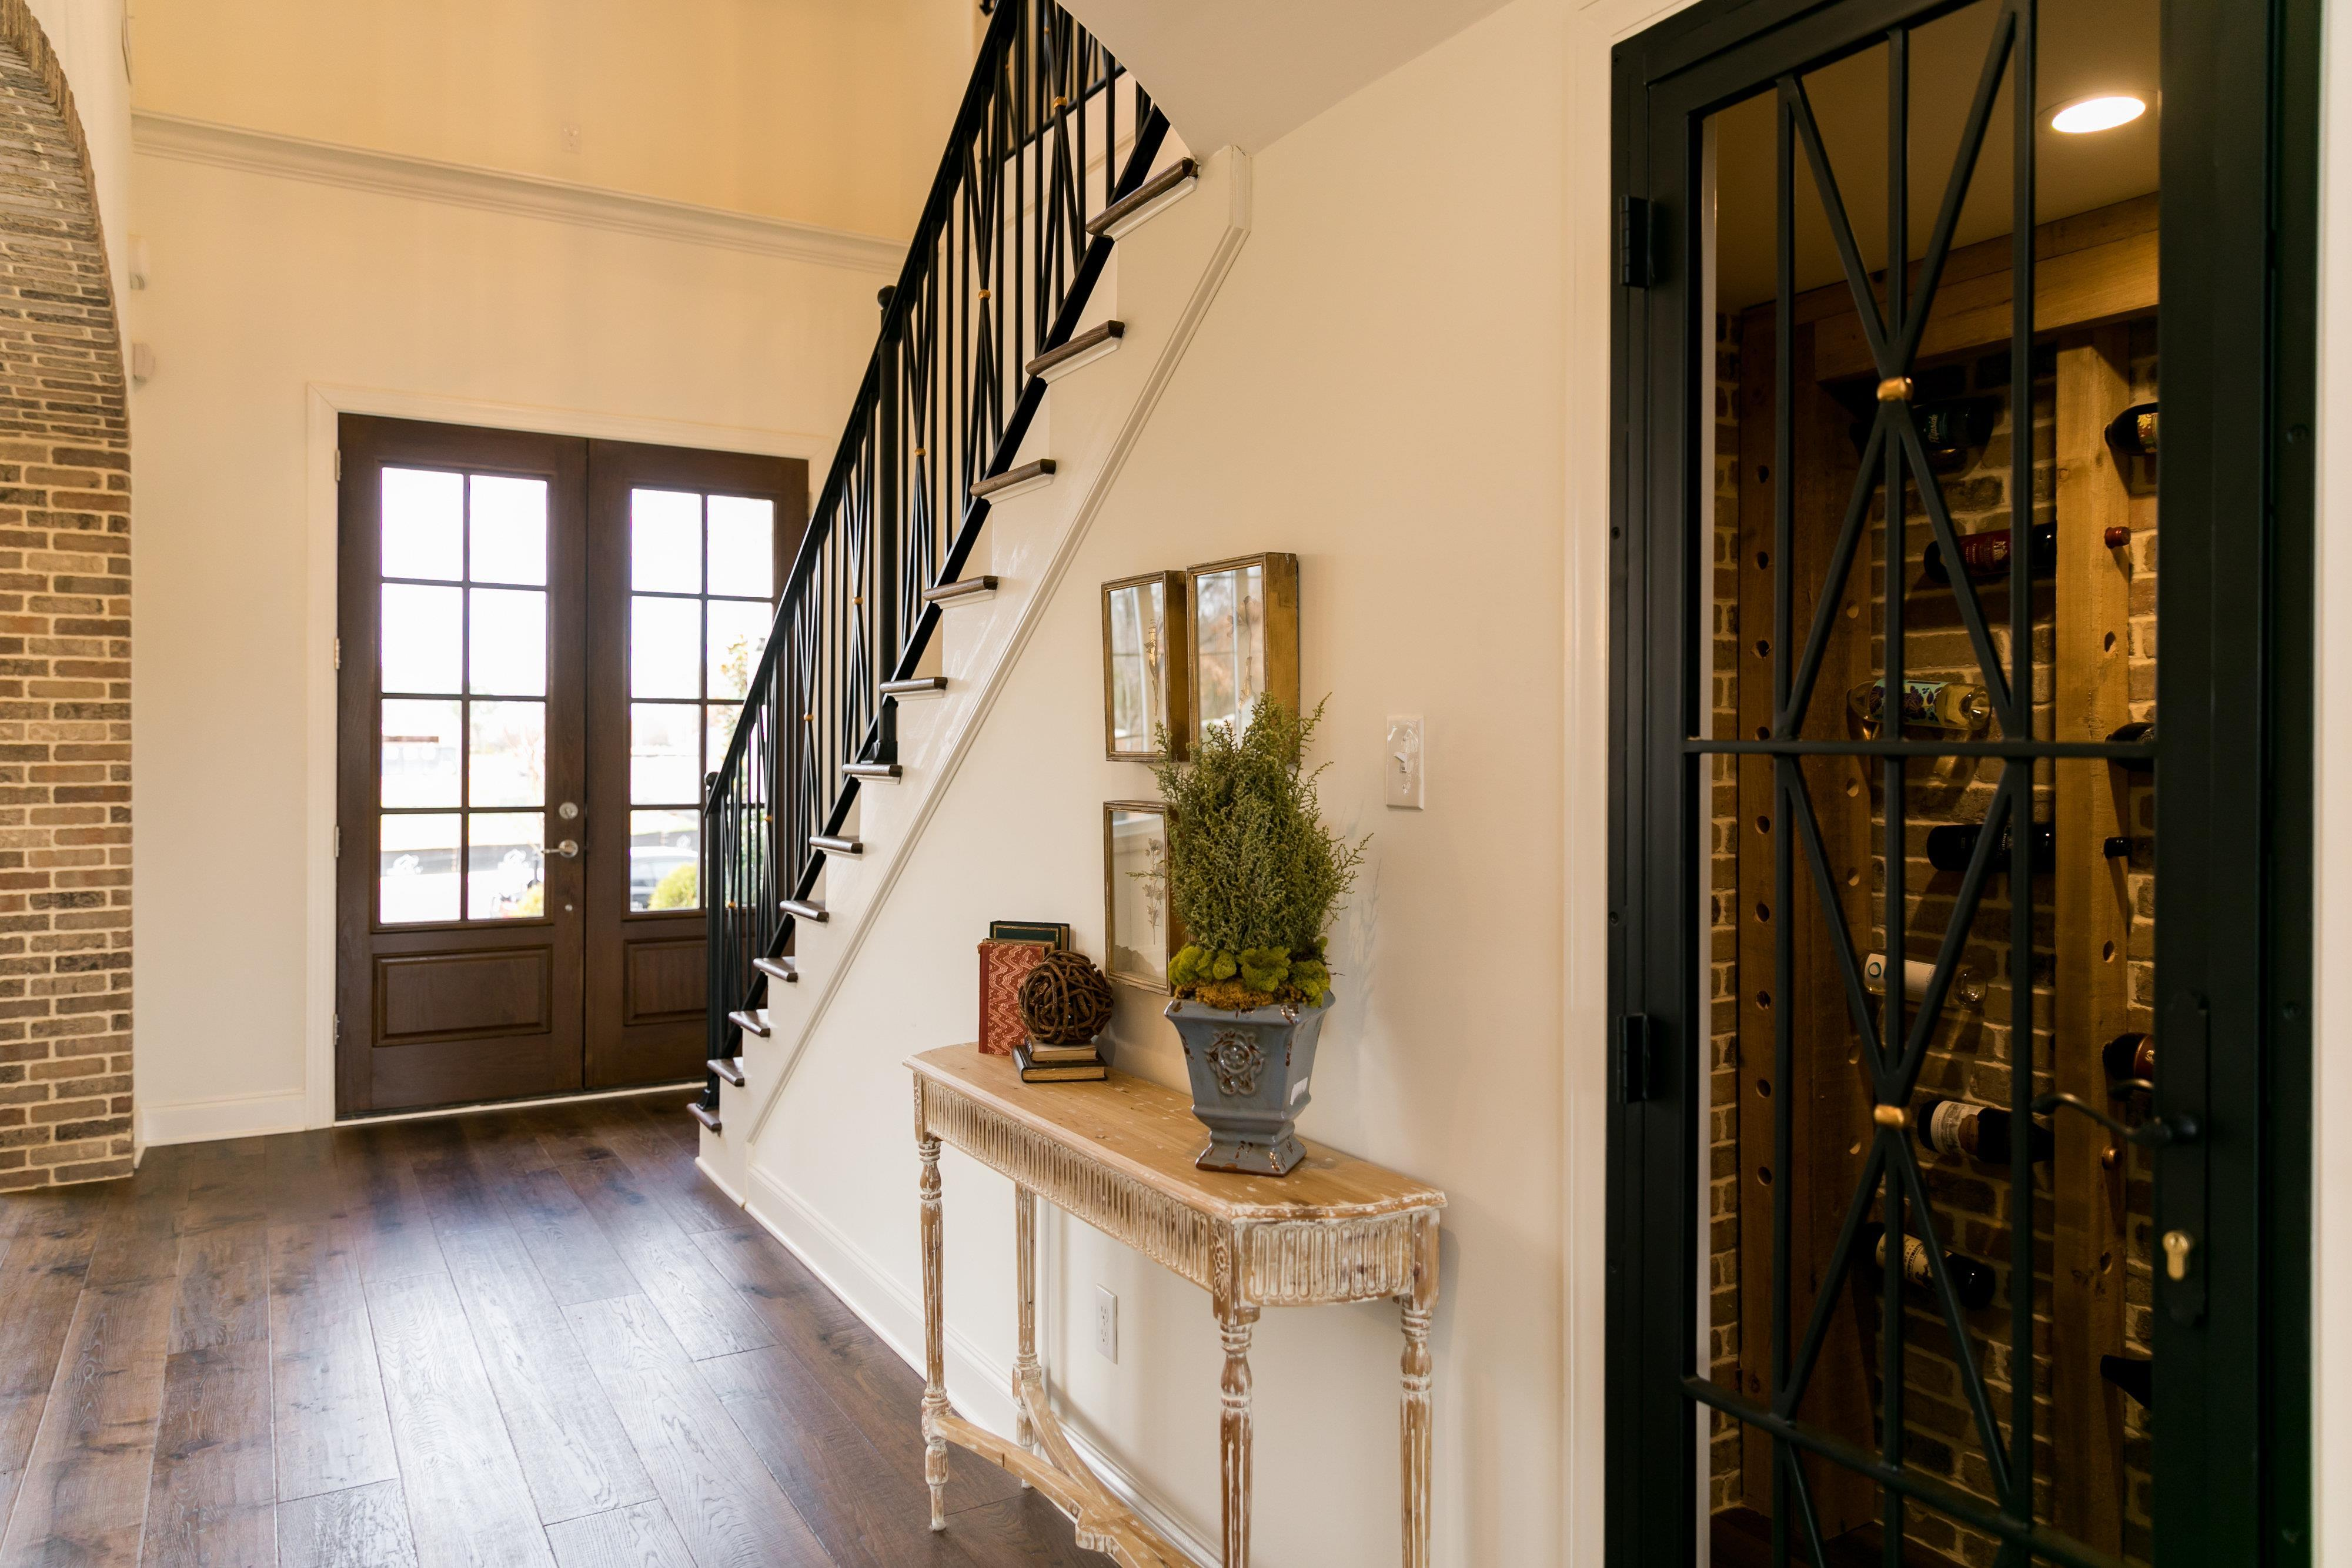 Living Area featured in the Ellington By Regency Homebuilders in Memphis, TN